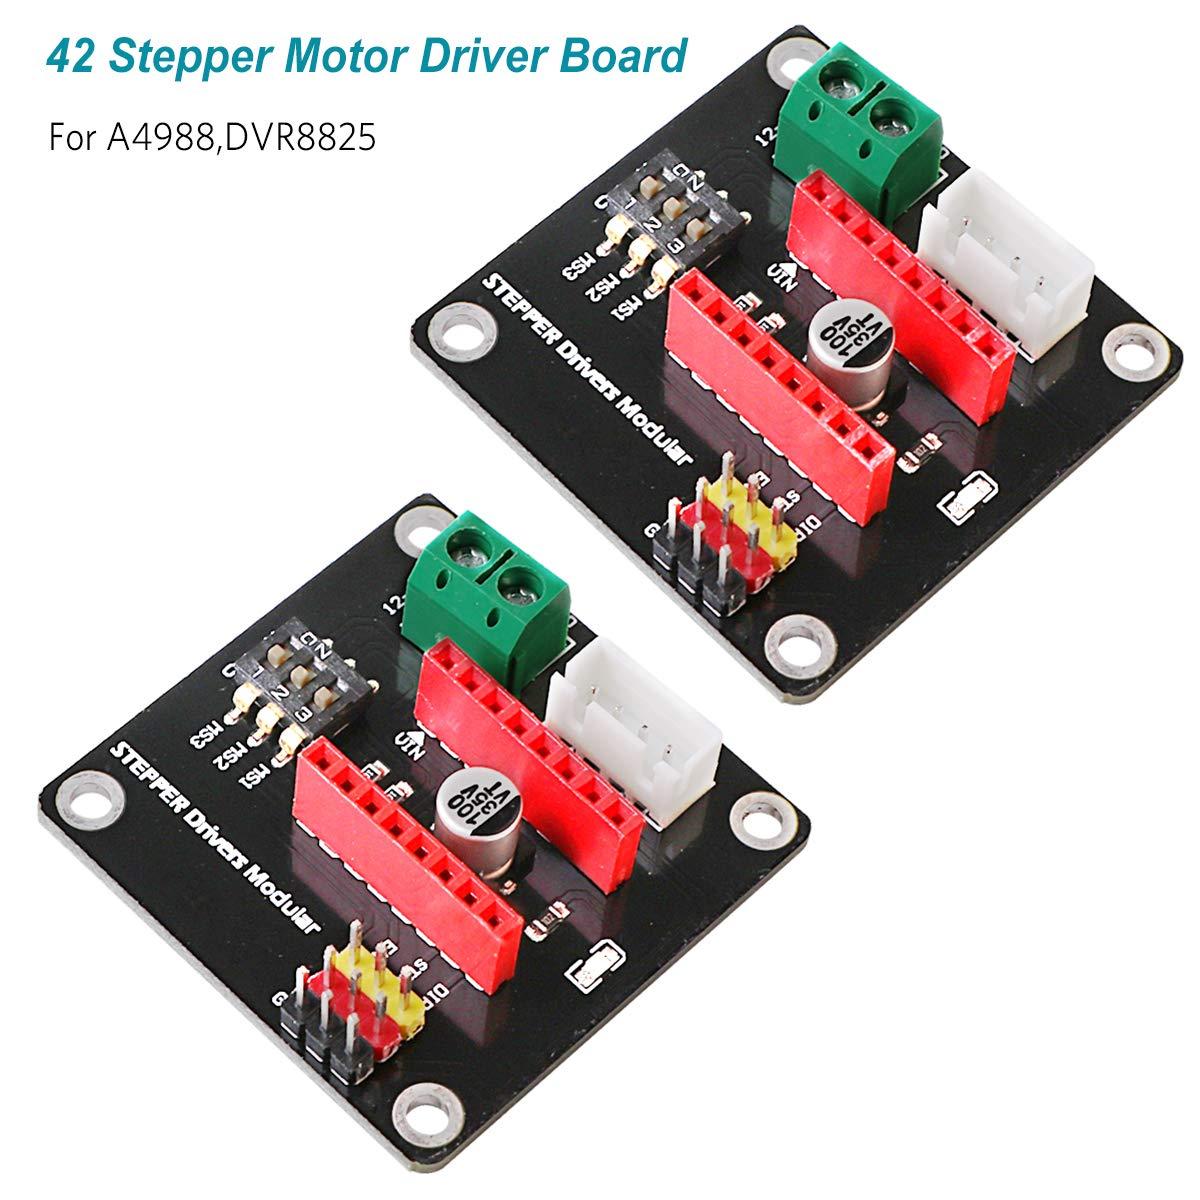 Innovateking-EU 2pcs 3D Printer 42 Stepper Motor Driver Control Expansion Board Shield Module DRV8825 / A4988 for Arduino UNO R3 DIY Kit